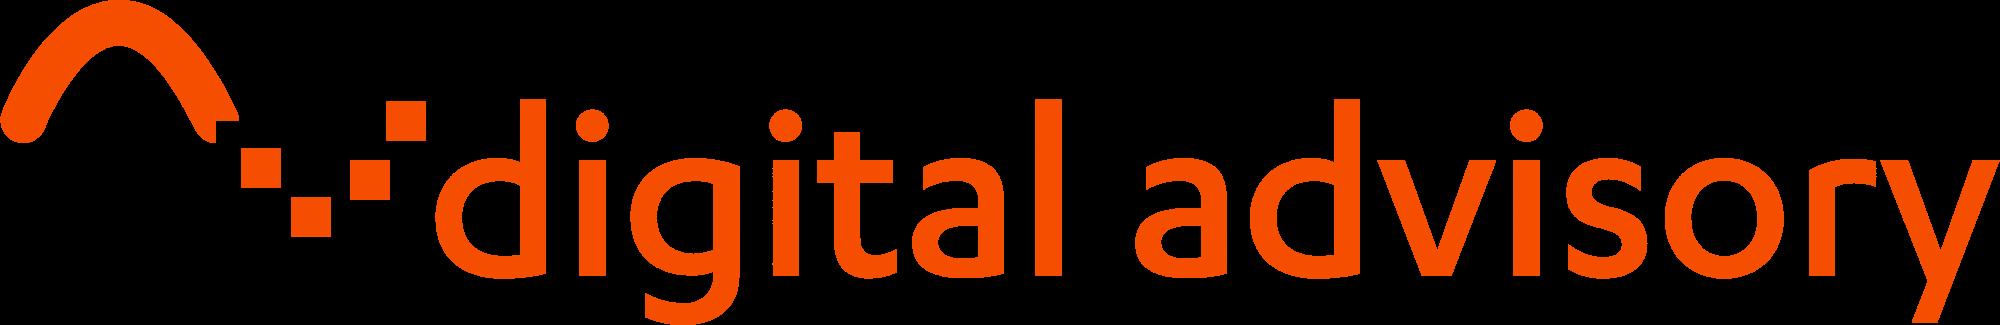 digital advisory